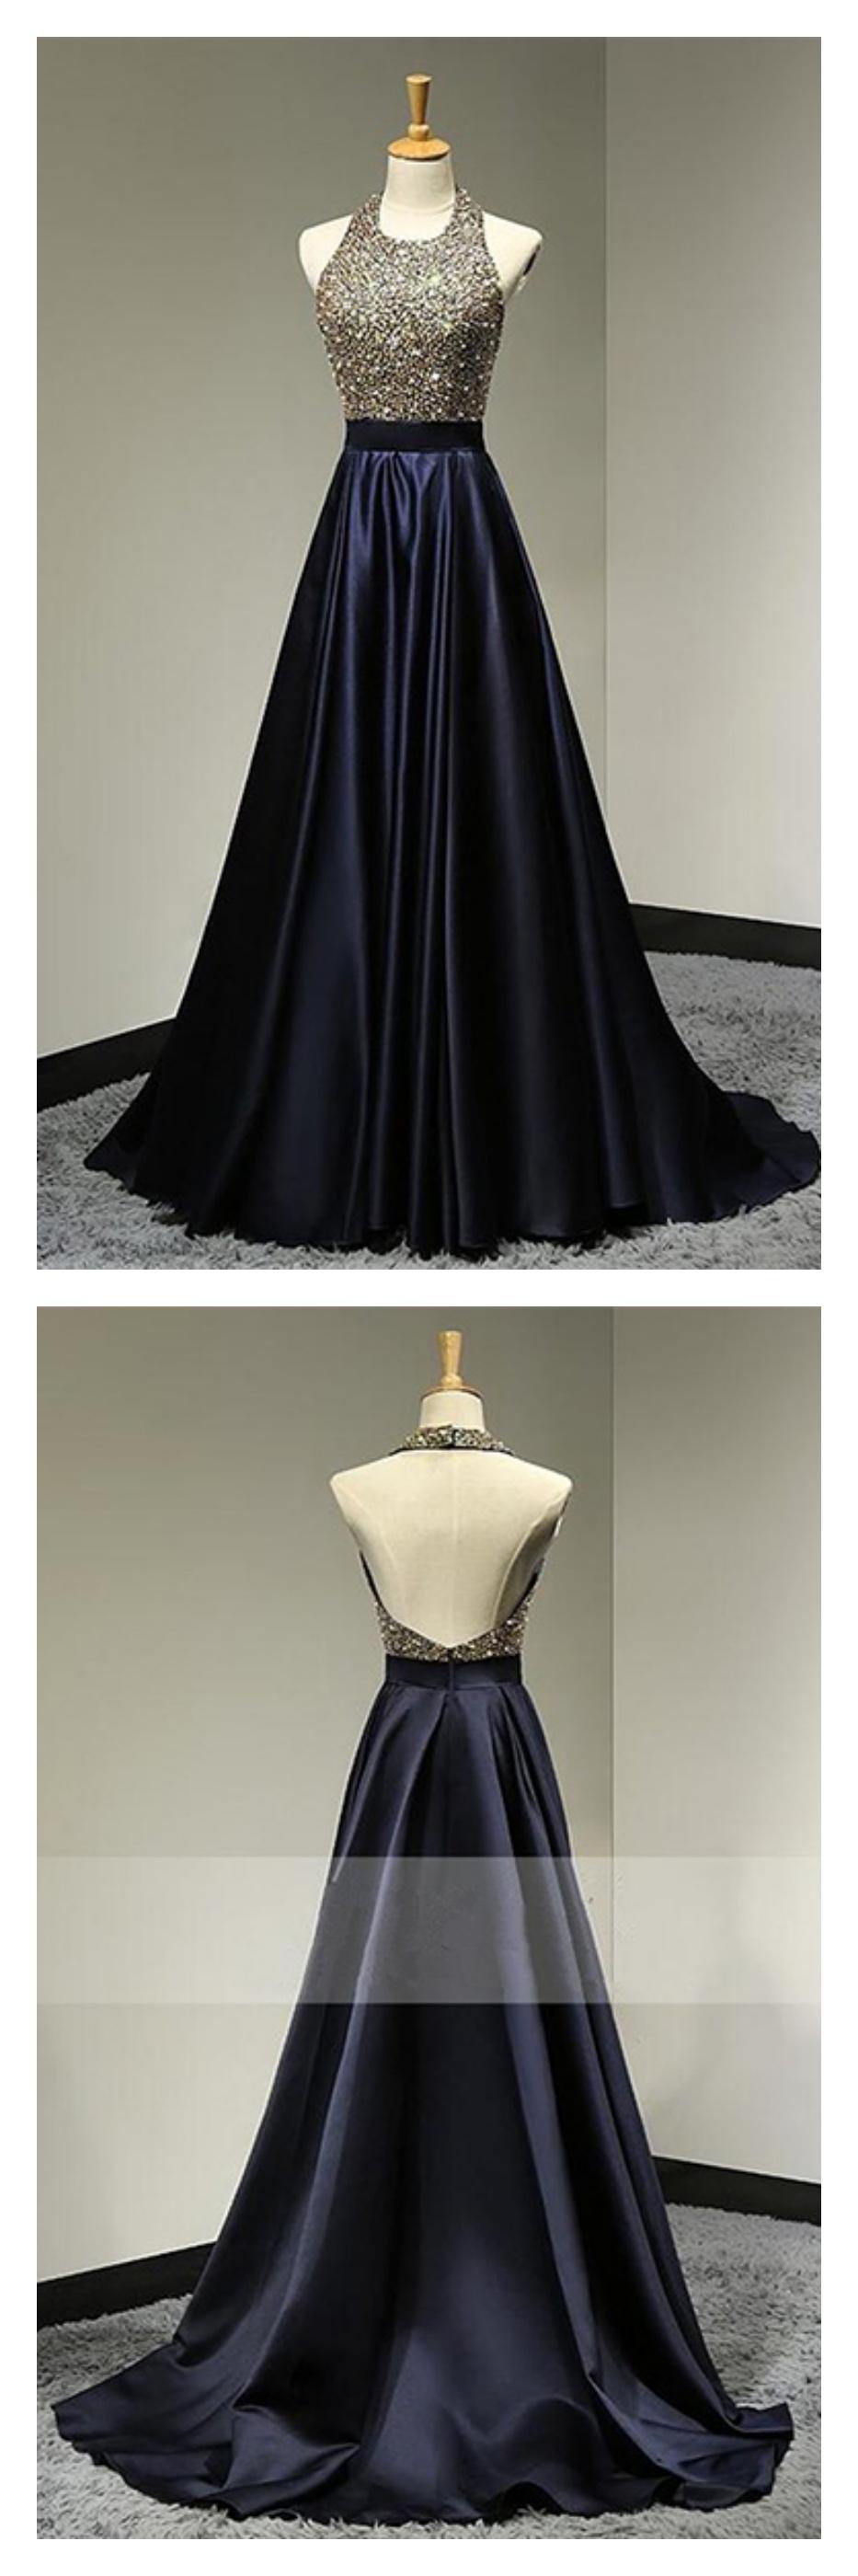 Halter beading bodice backless long satin prom dresses evening